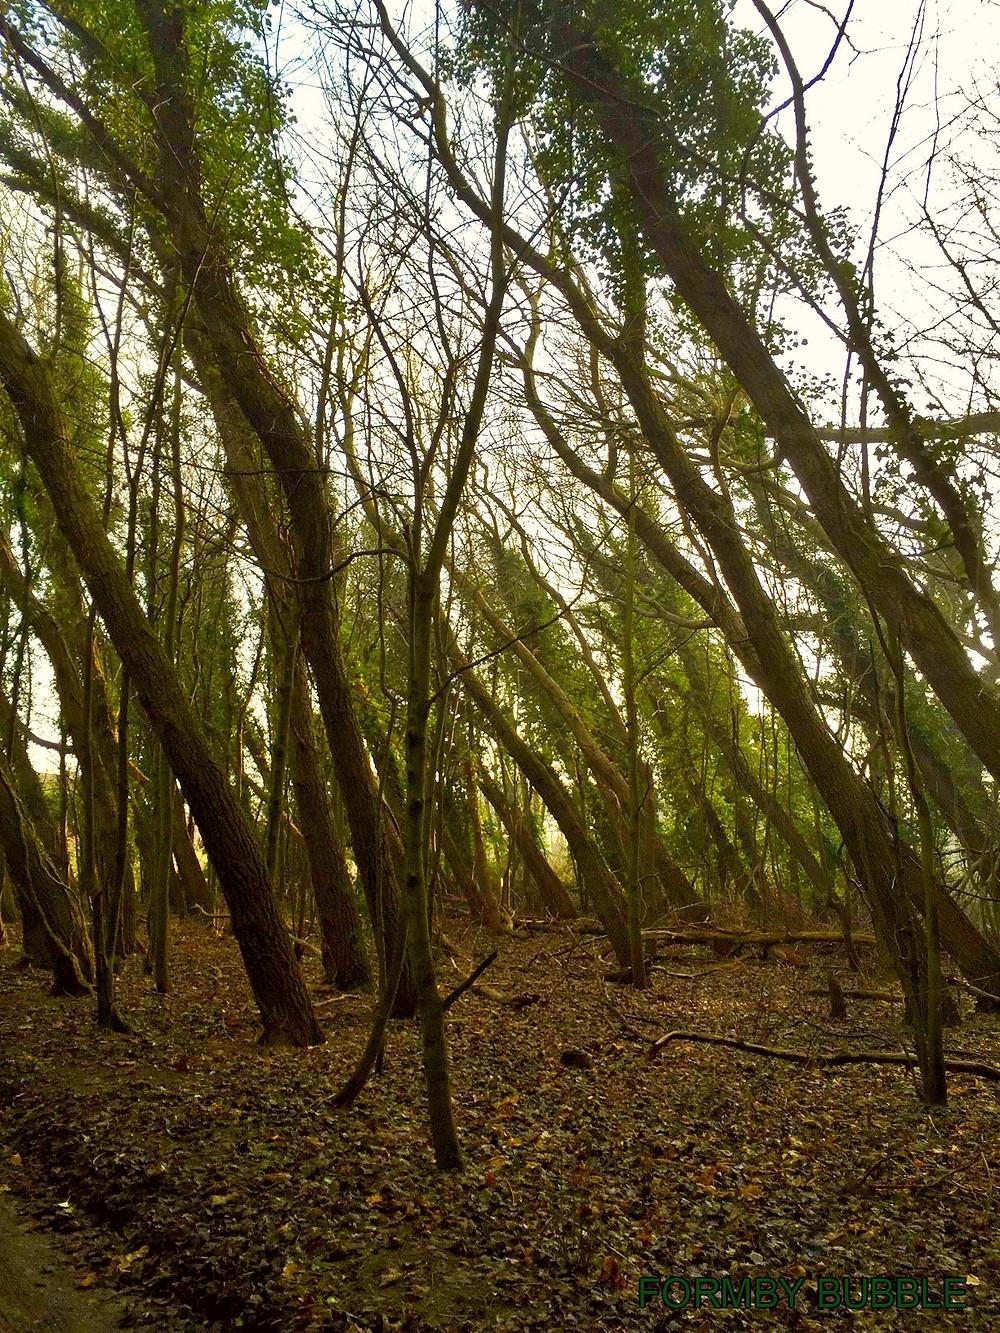 Trees bent2.jpg